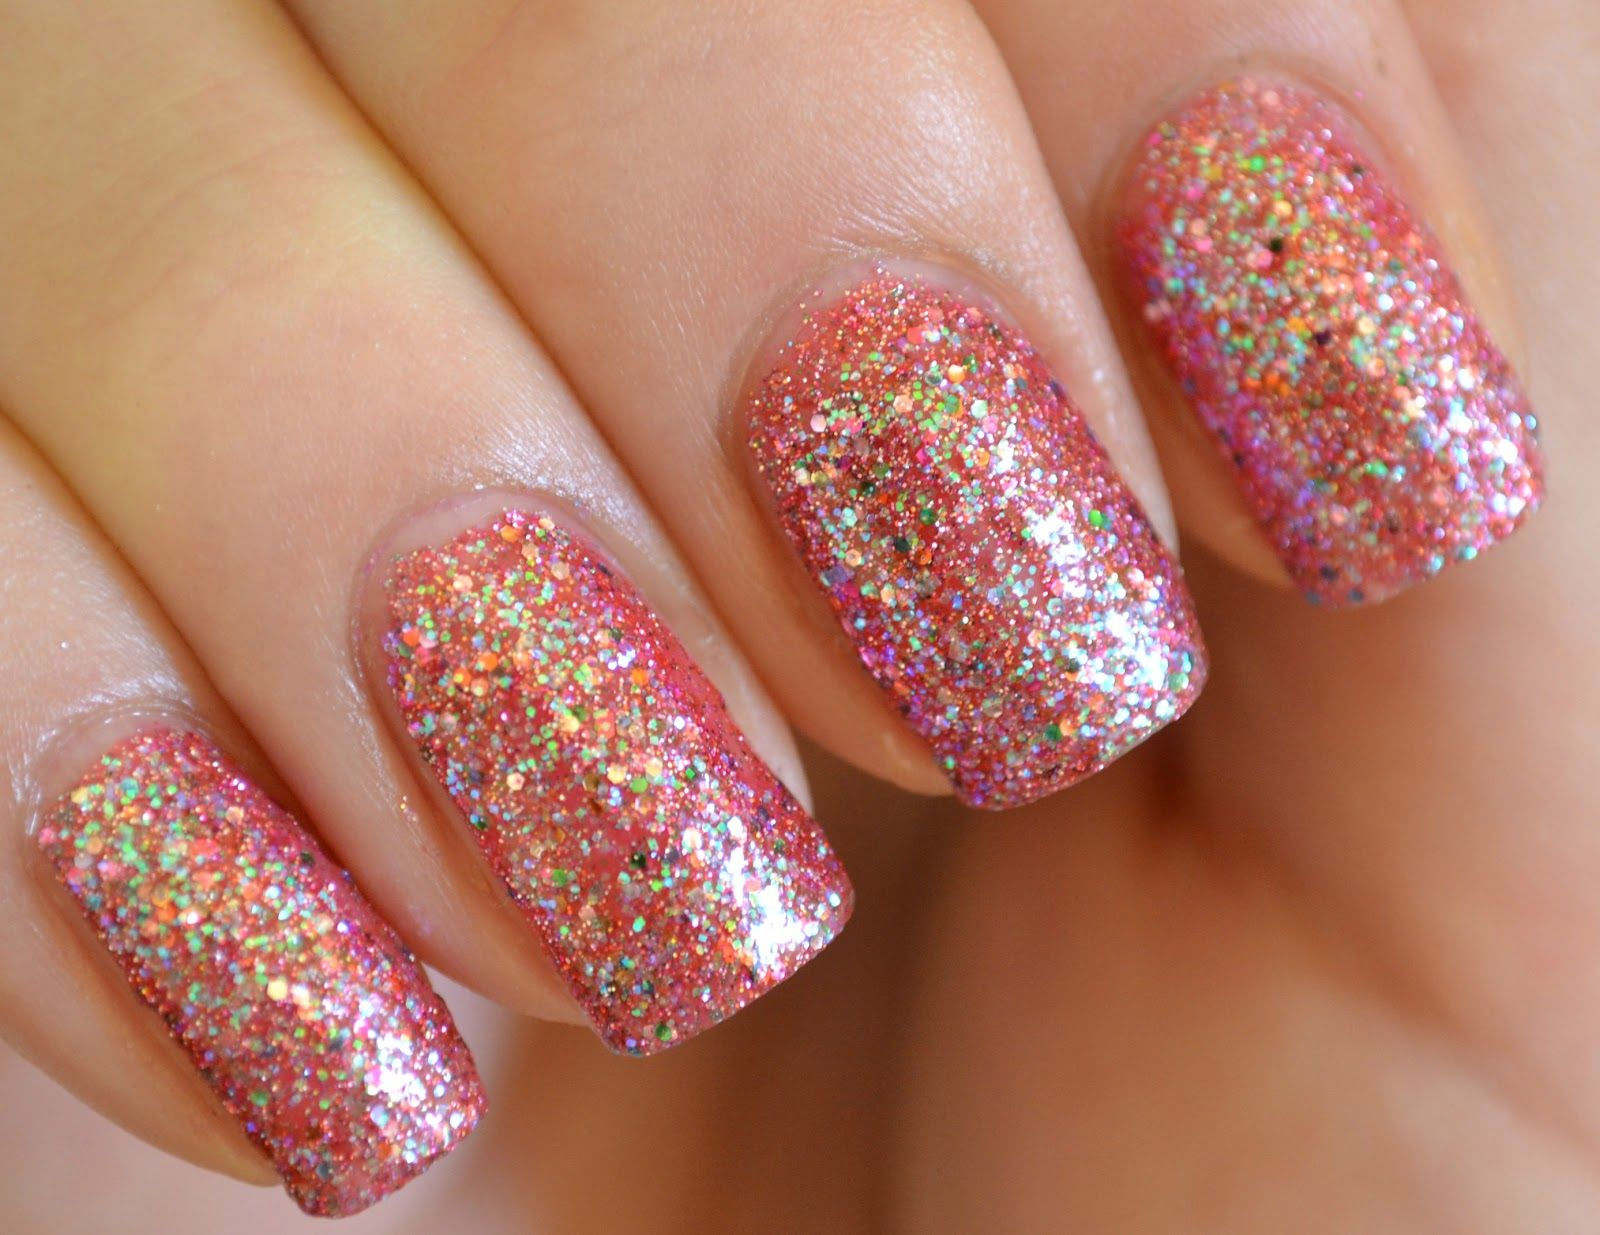 Superior Nail Art Glitter Gel Acrylic Viva La Nails Glitter Our Glitter Nail Art